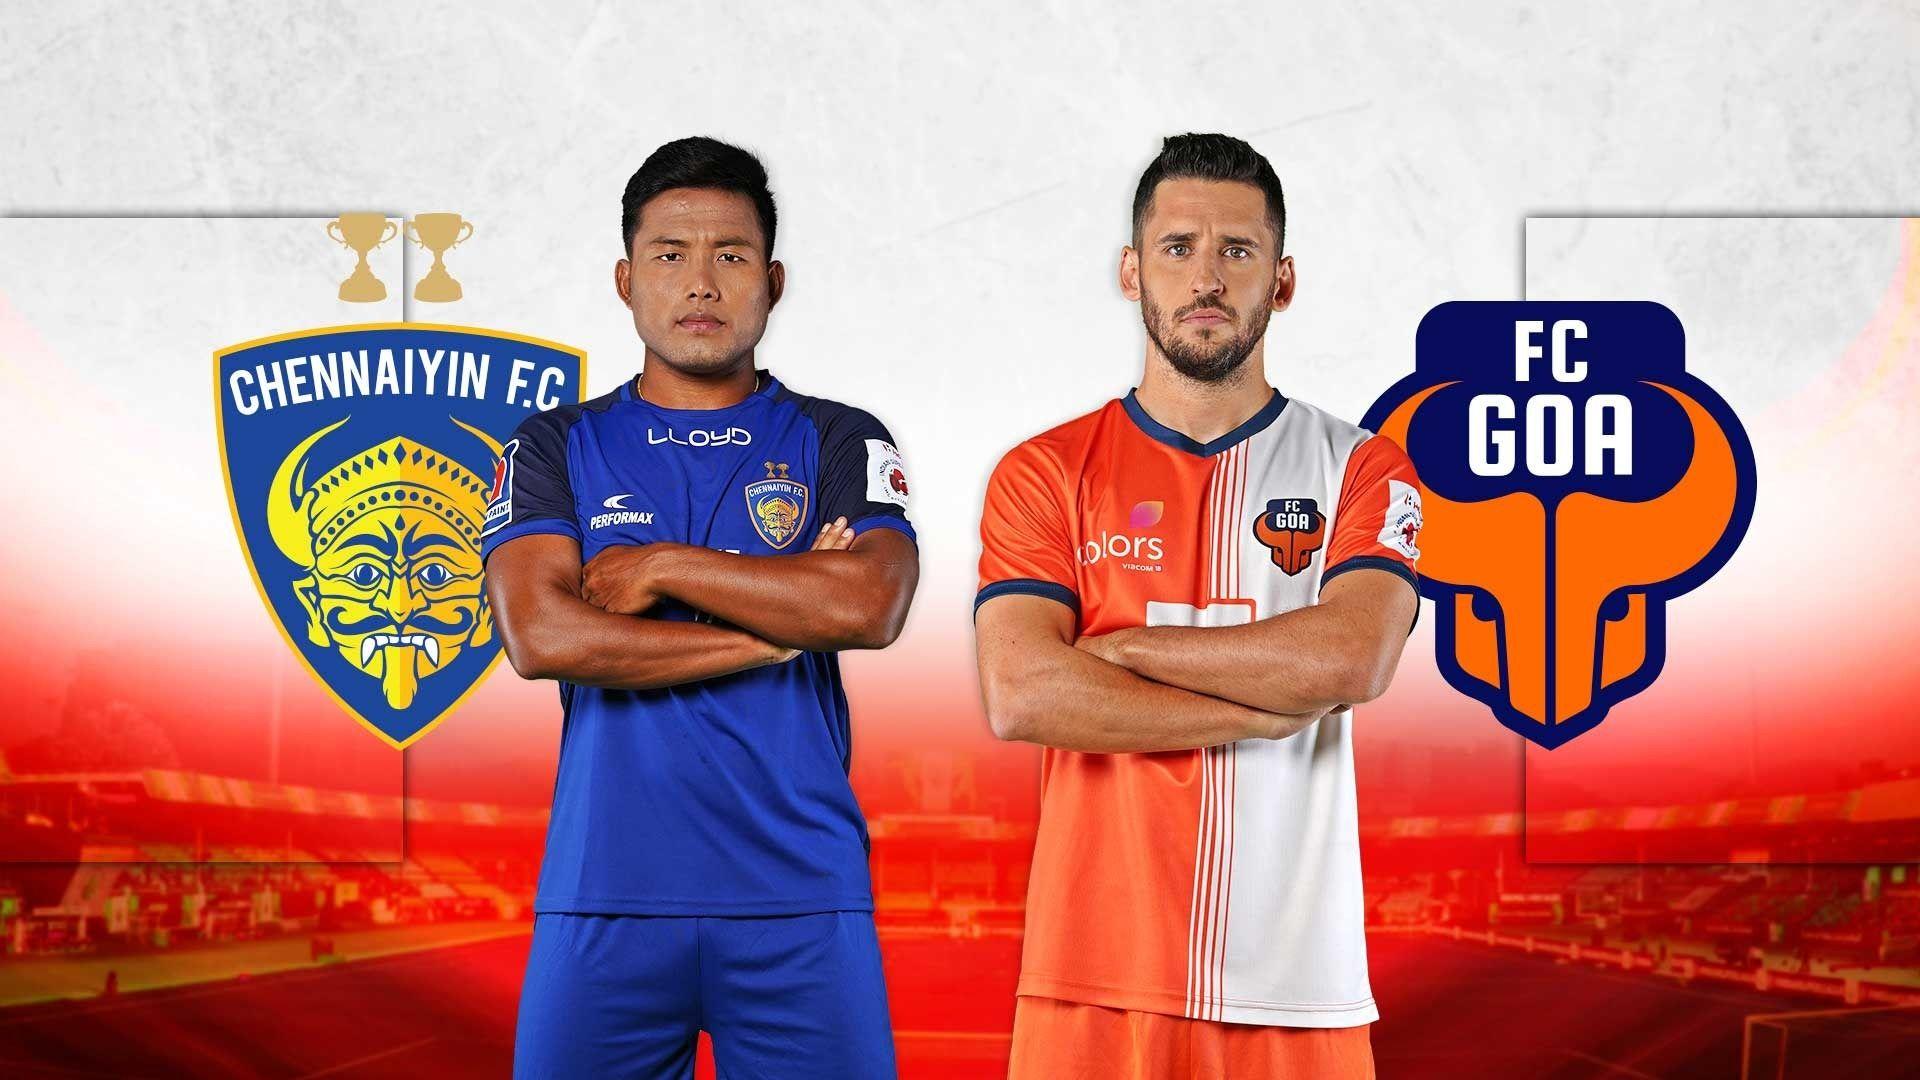 ISL 5 - Chennaiyin vs FC Goa Live Streaming, Preview, Teams News